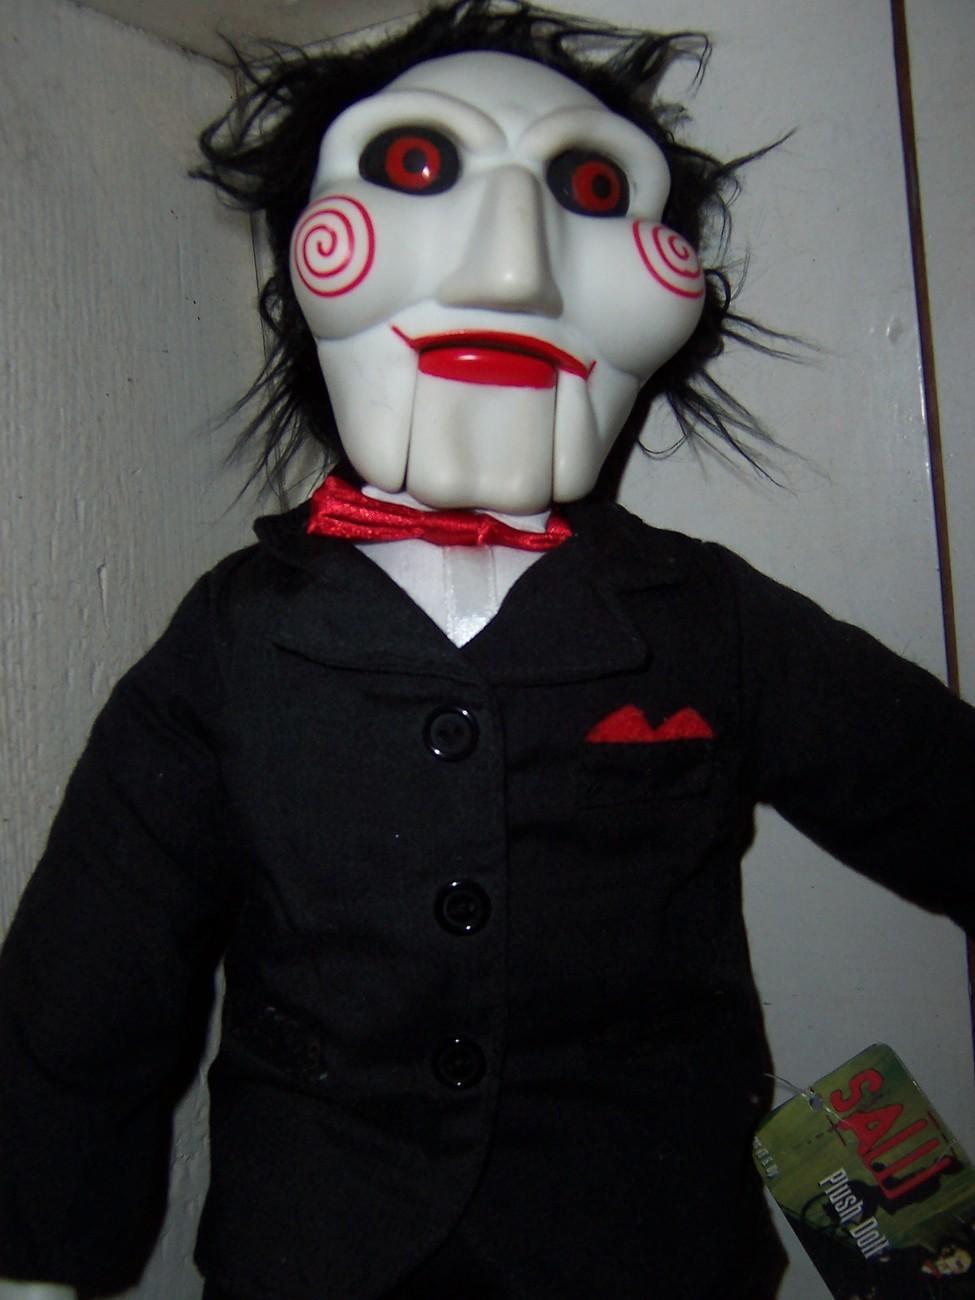 vintage 1st jig saw horror movie talking doll 2004 20